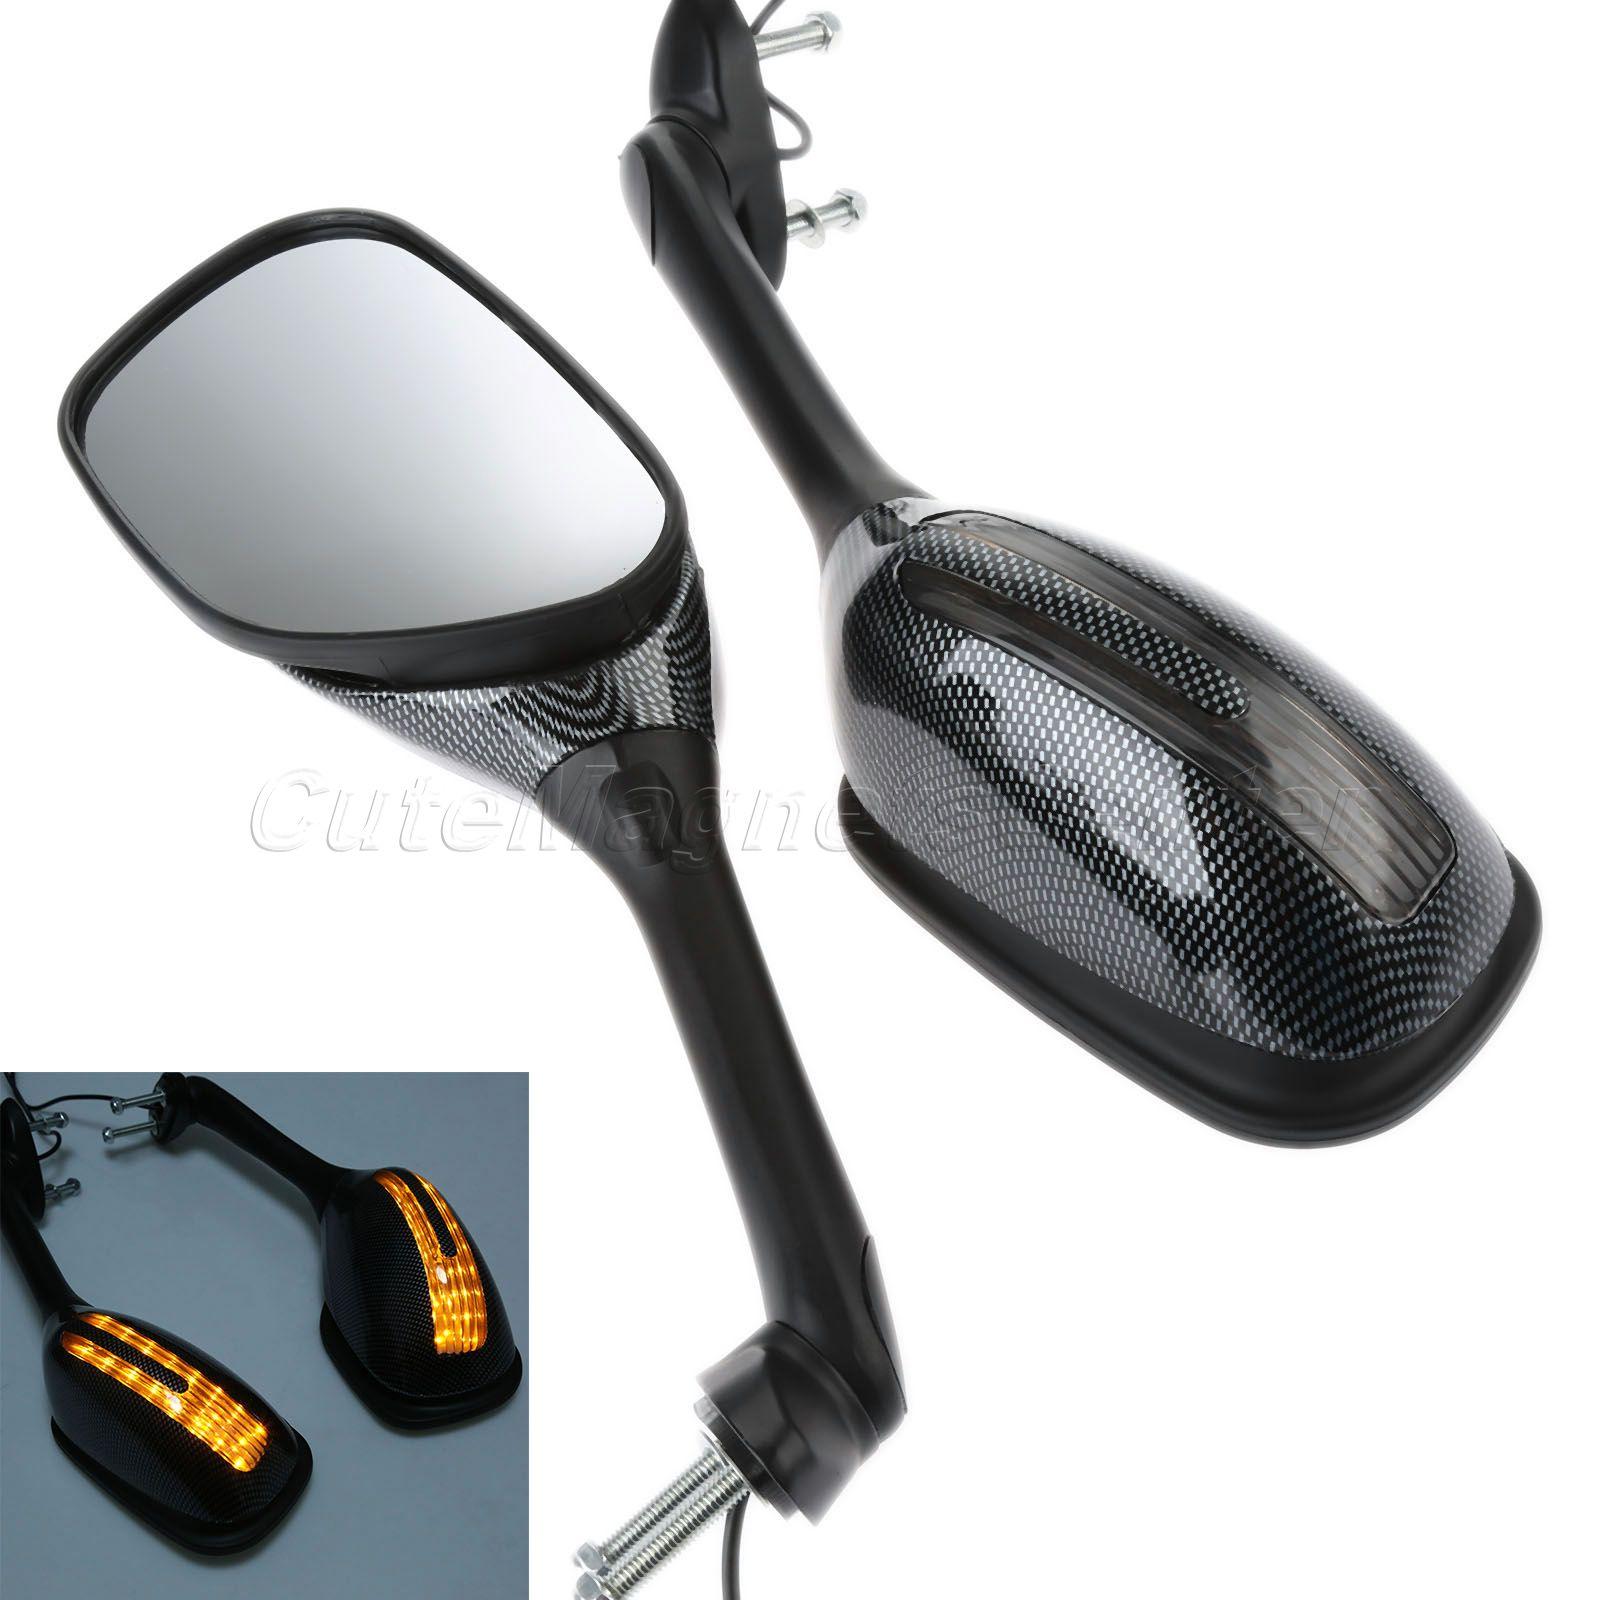 Mtsooning 2pcs Motorcycle Rear Mirrors with LED Light for Honda Yamaha Ducati Suzuki Kawasaki